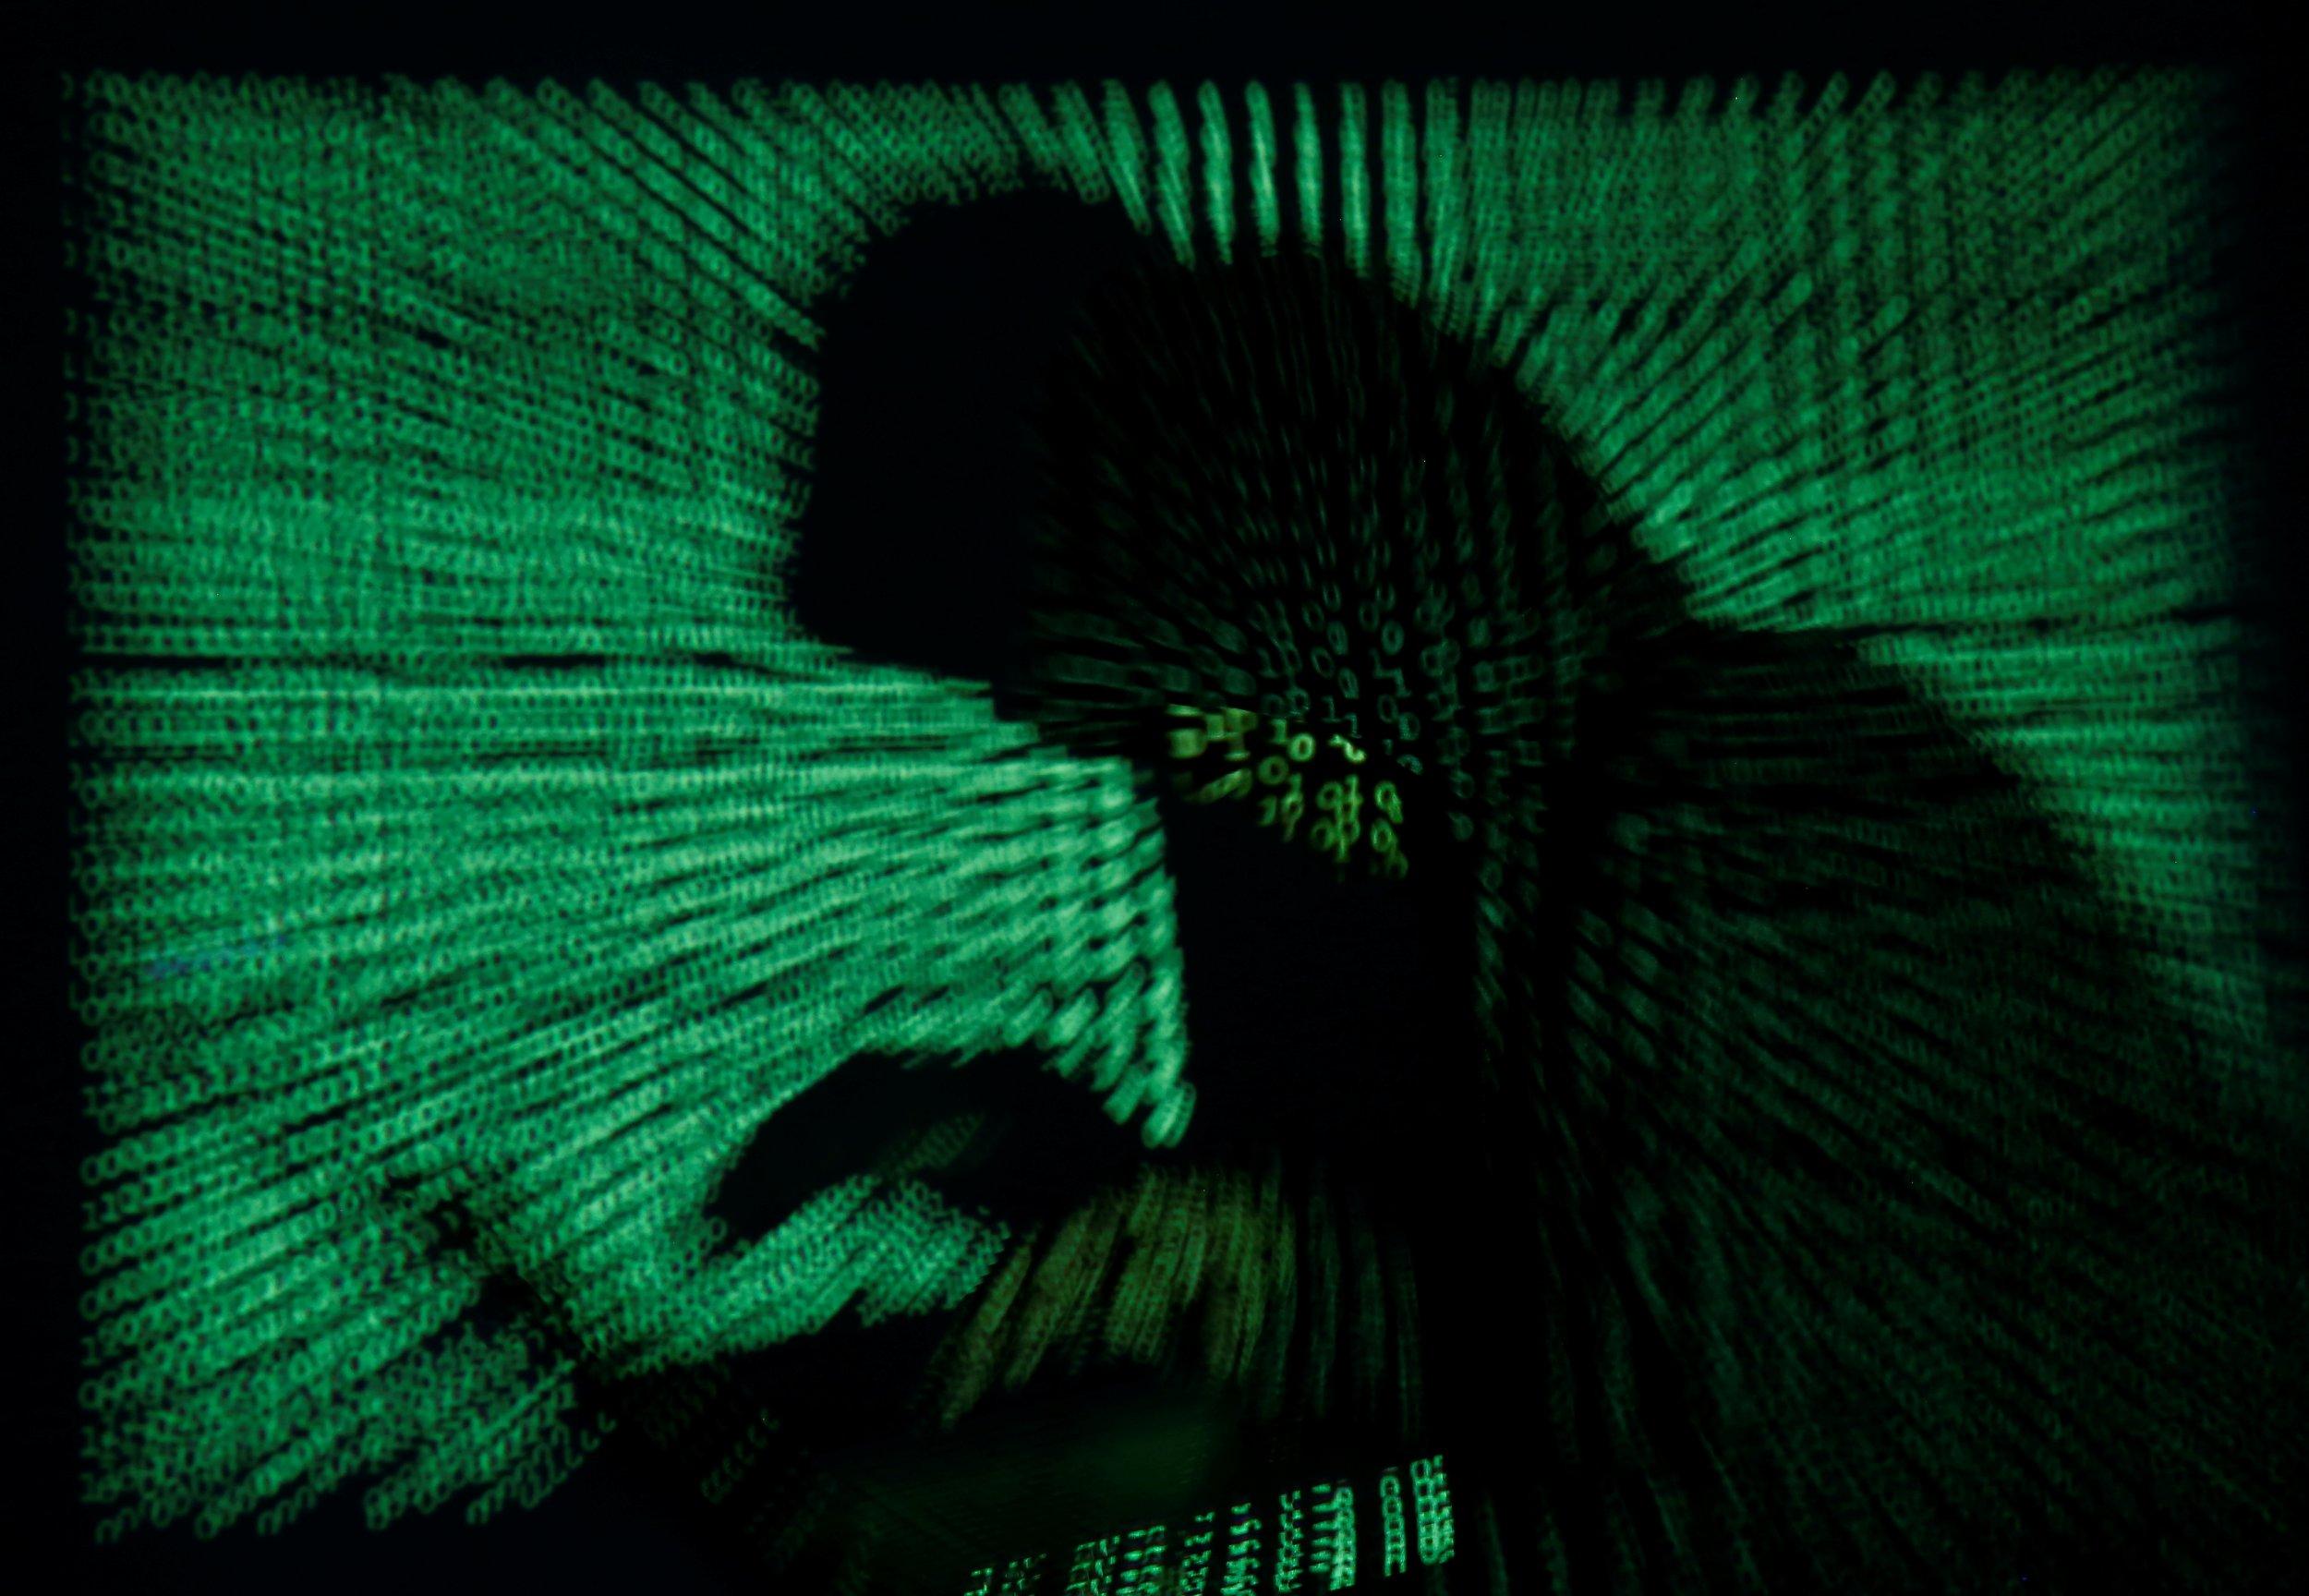 10_18_Hackers_smartwatches